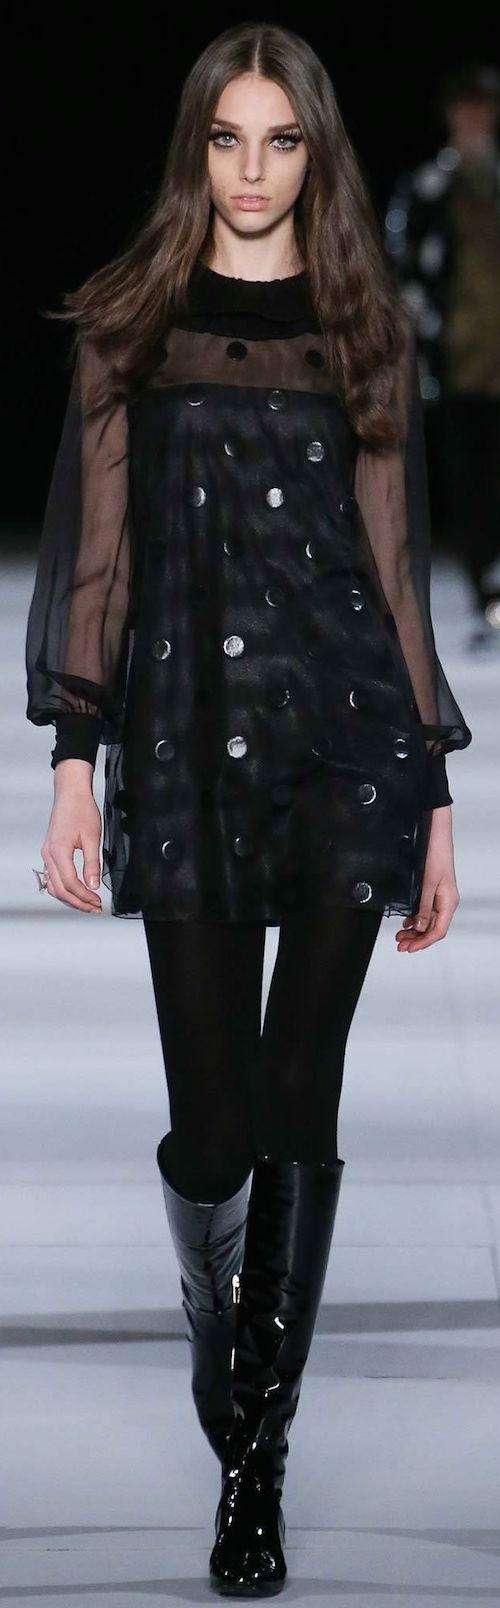 Un clásico outfit de Yves Saint Laurent para inspirarte en estas fiestas.